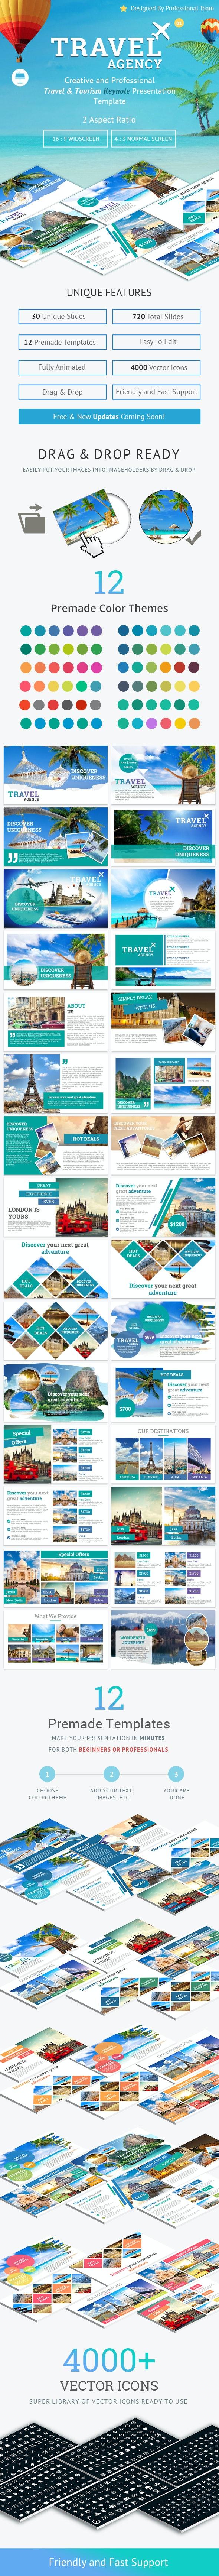 Travel and Tourism Keynote Presentation Template - Business Keynote Templates